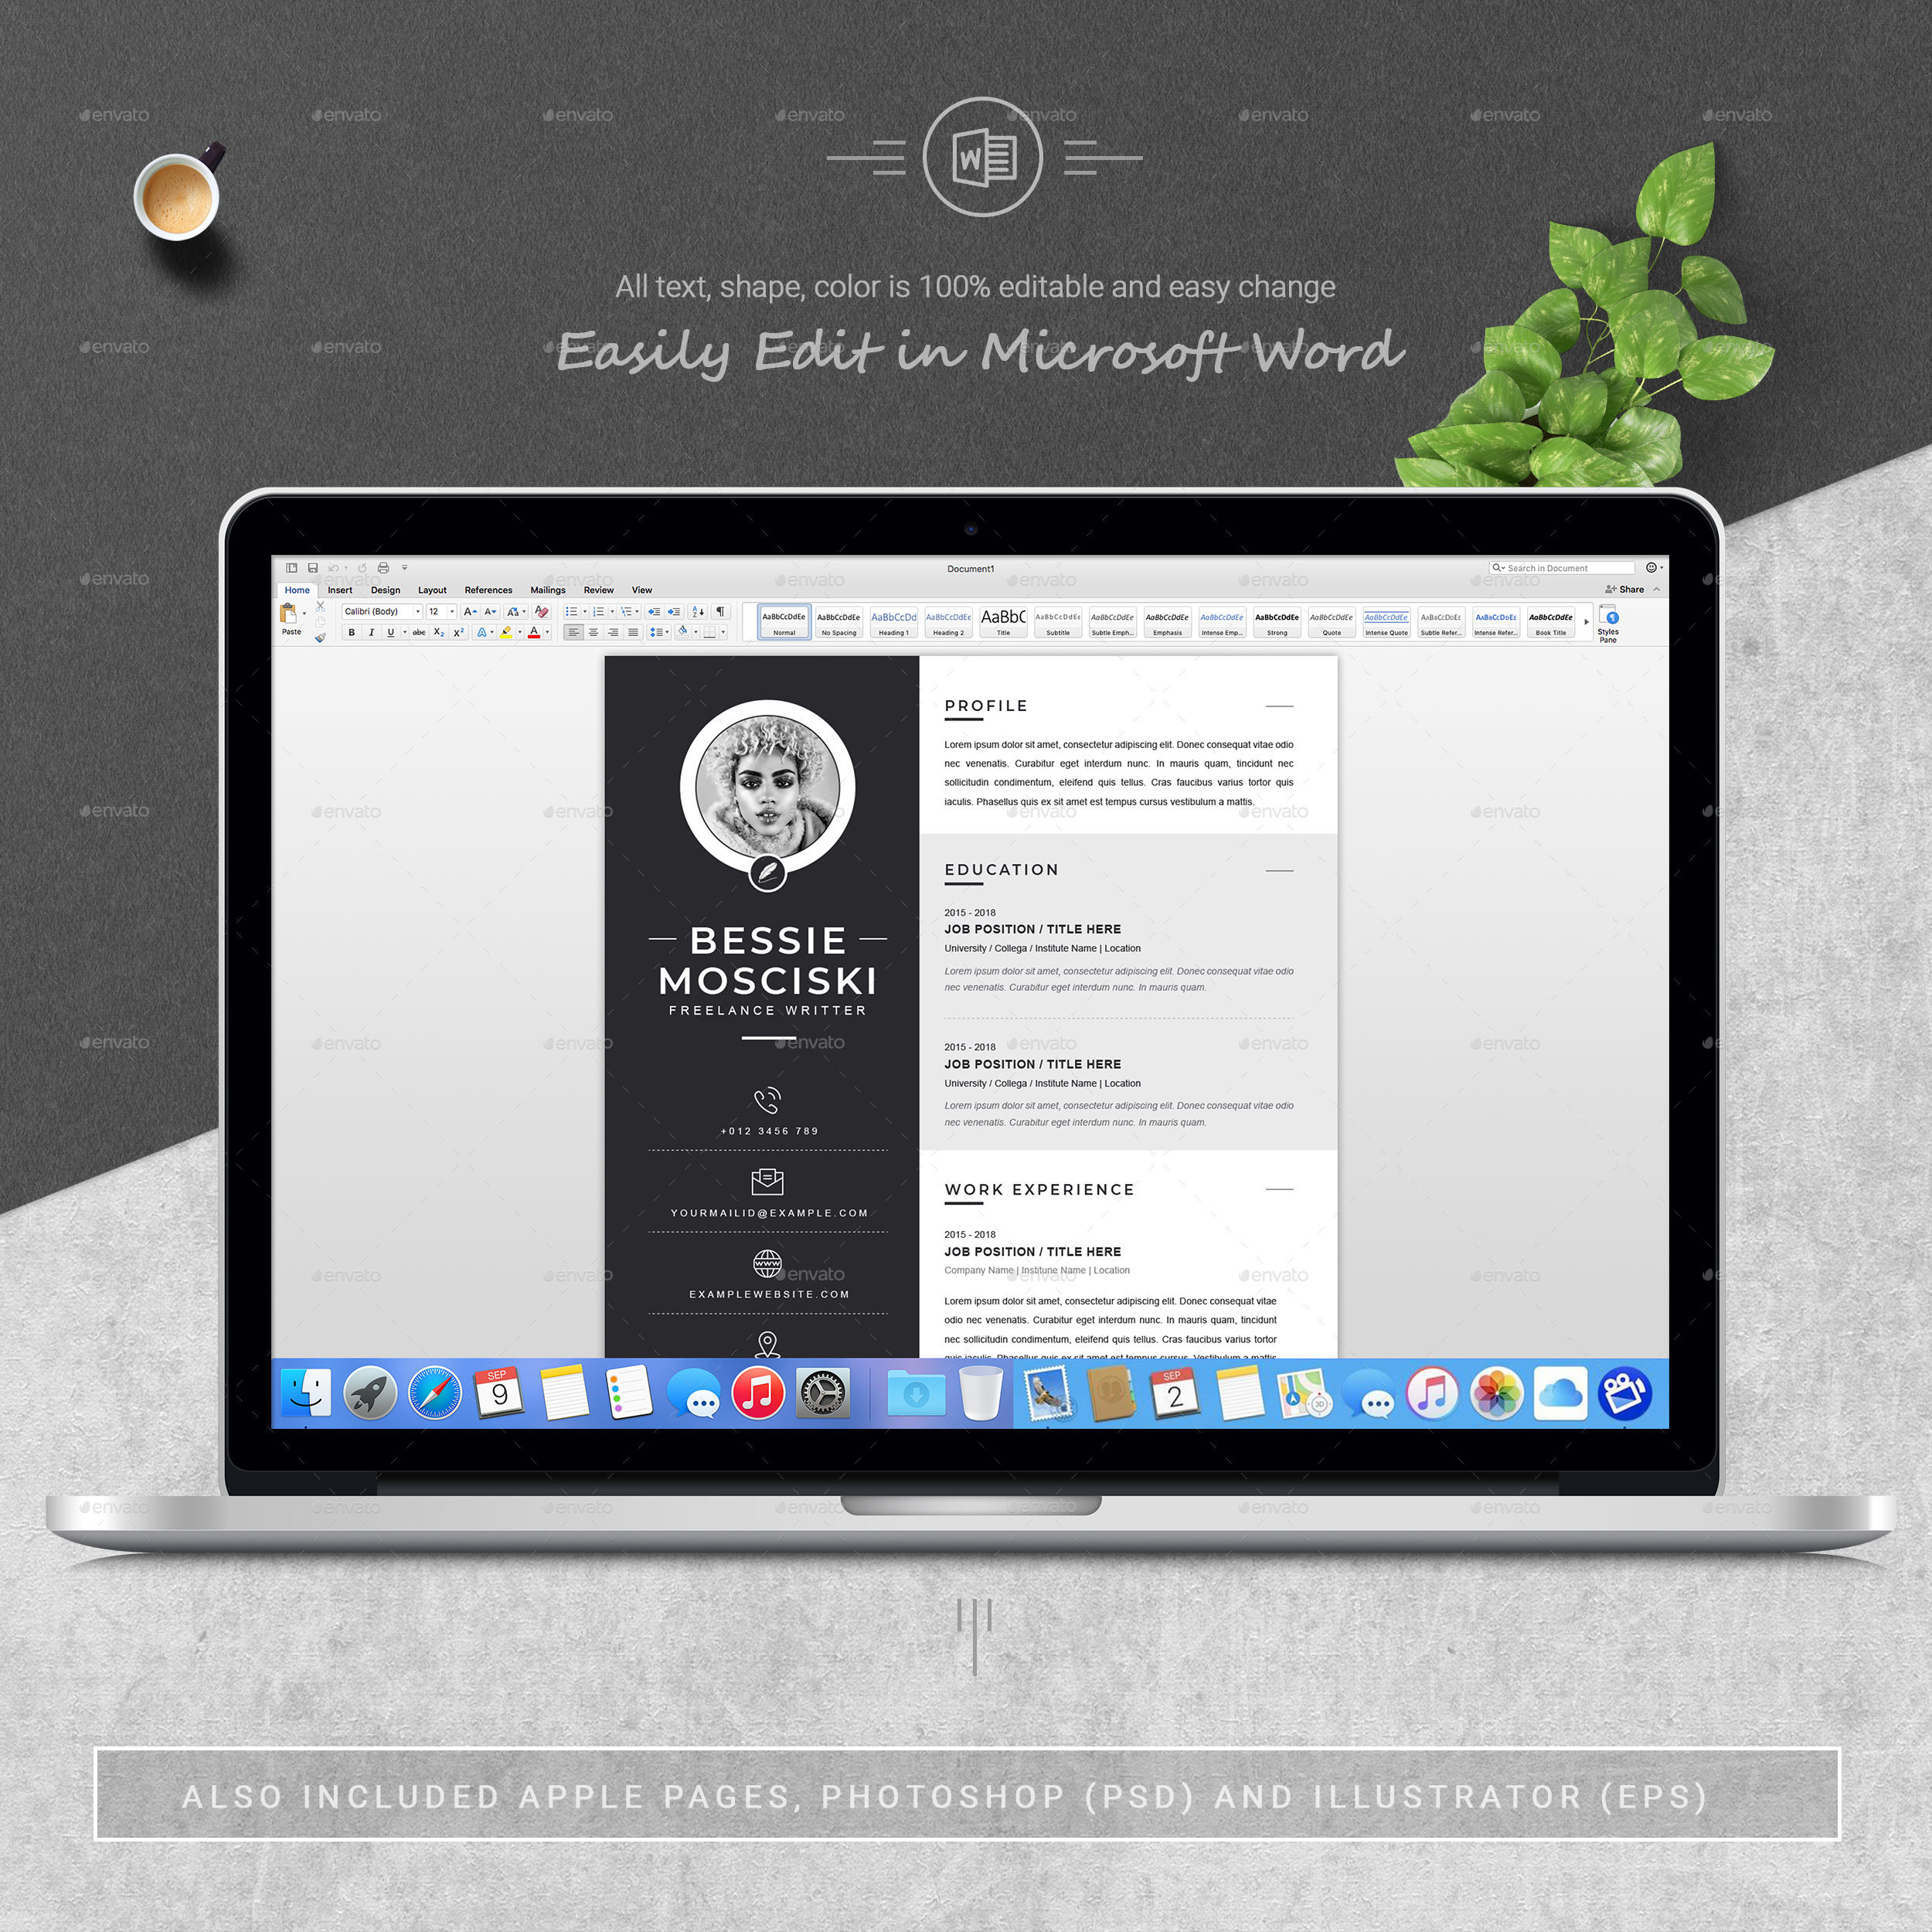 Resume By Resumeinventor